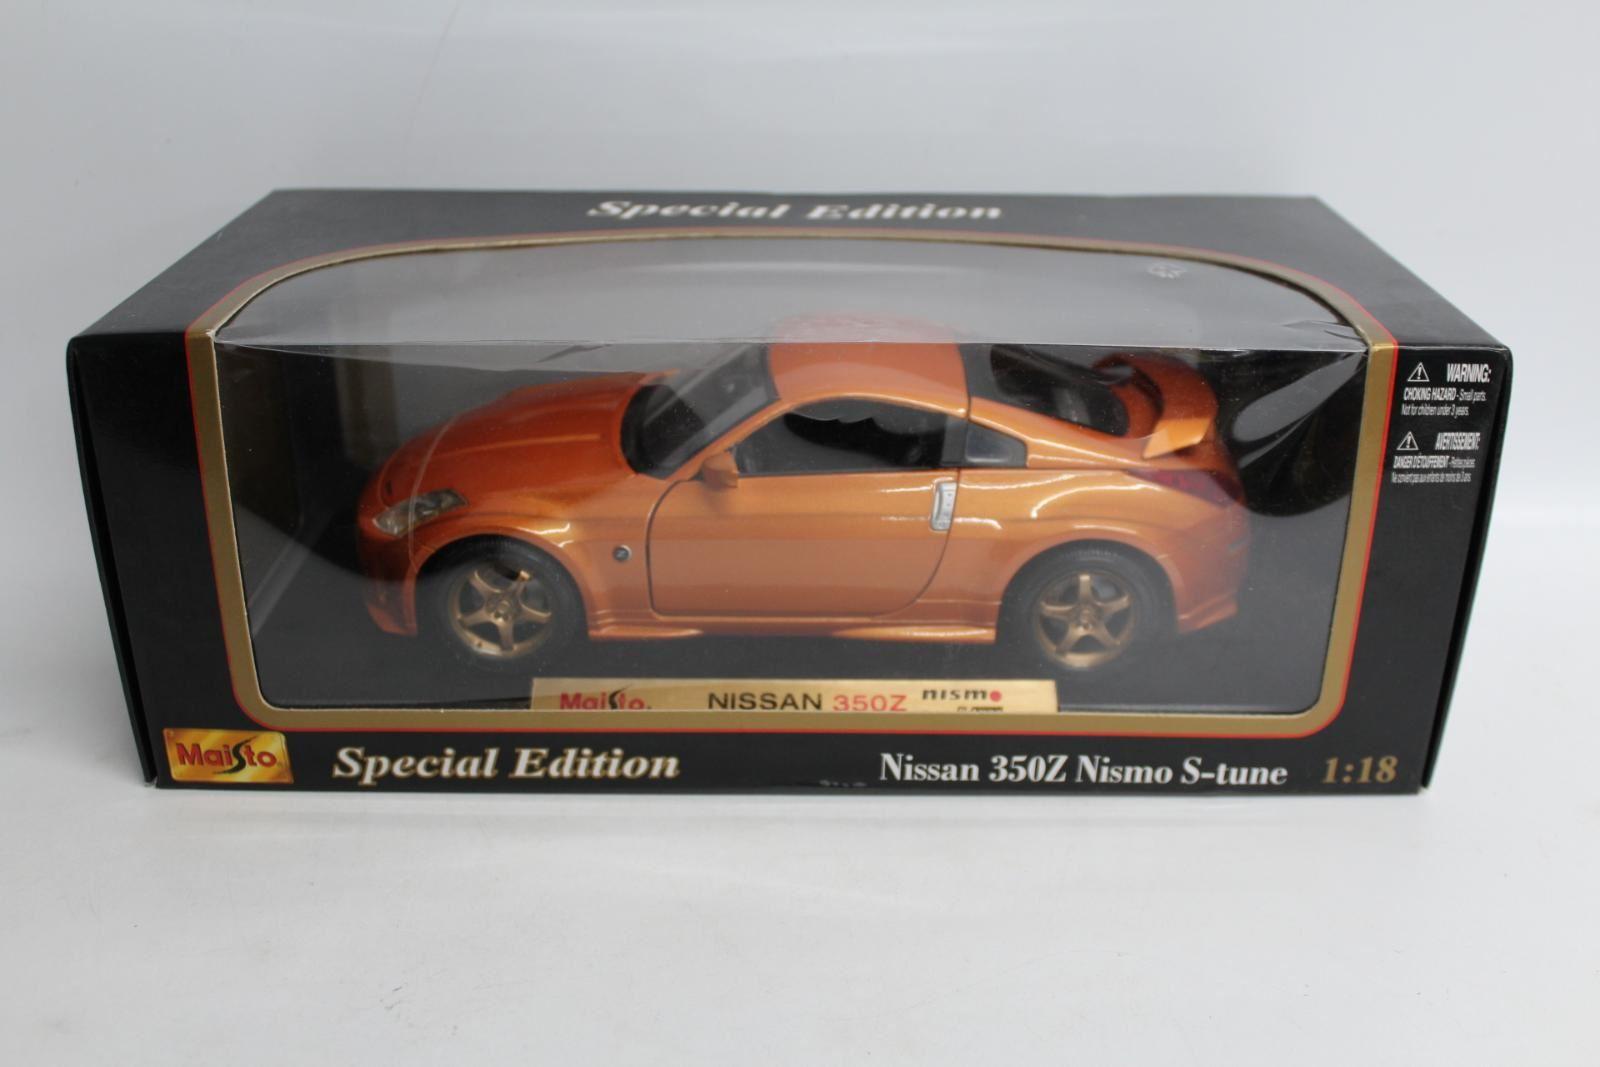 Maisto-31688-EDICIoN-Especial-Nissan-350z-Nismo-S-Tune-1-18-Escala-Modelo-de-Coche-Nuevo